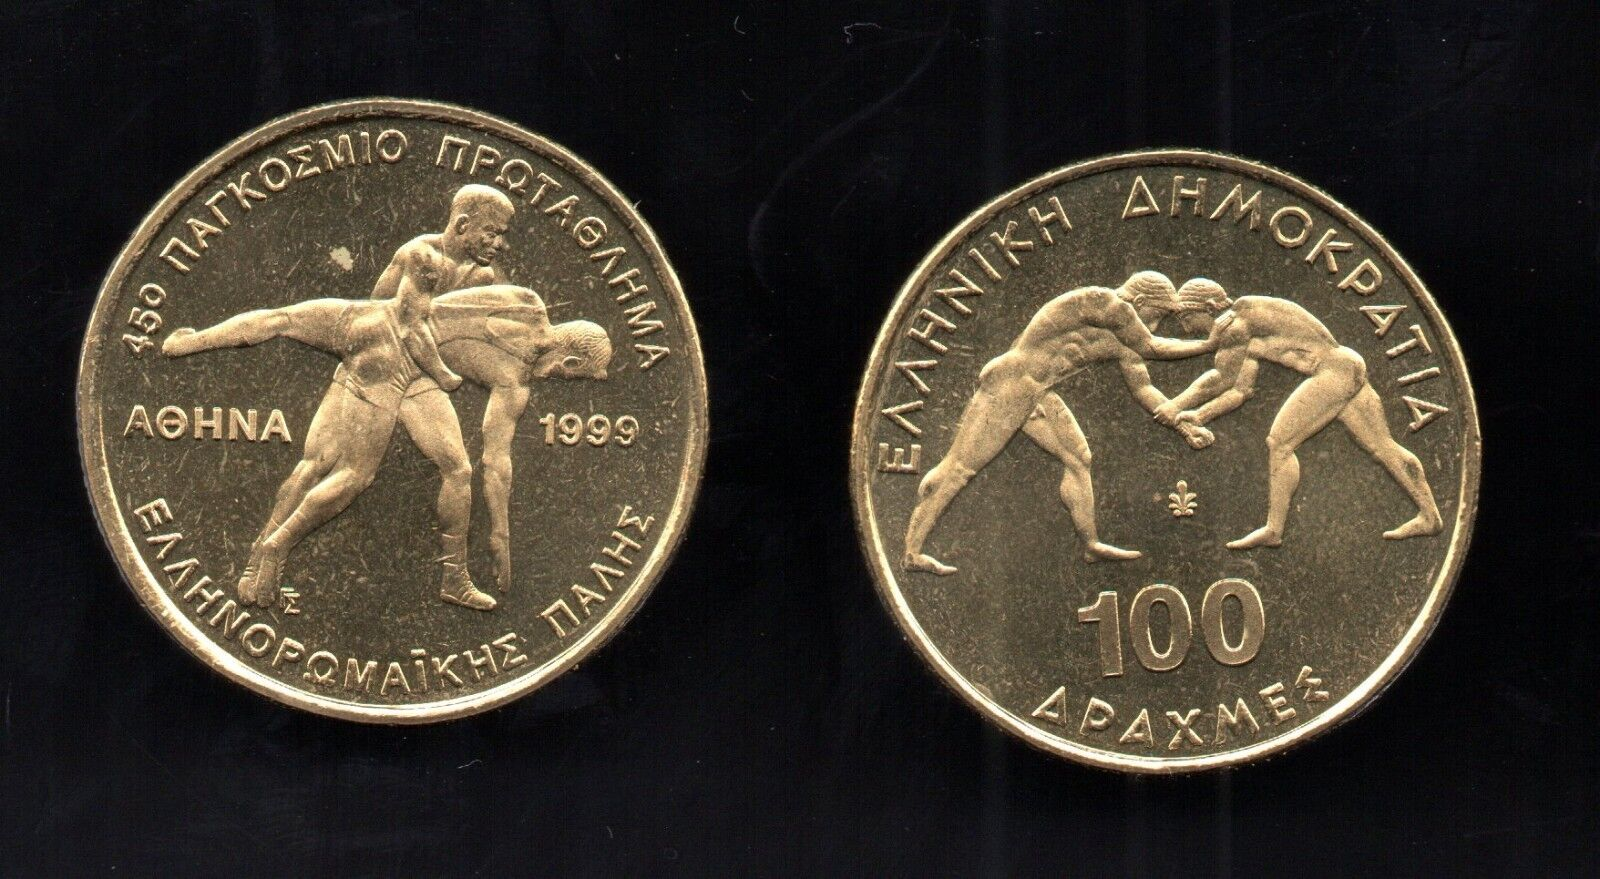 BANK OF GREECE 100 drachmas 1999 UNC WRESTLERS World Championship Greek Coin